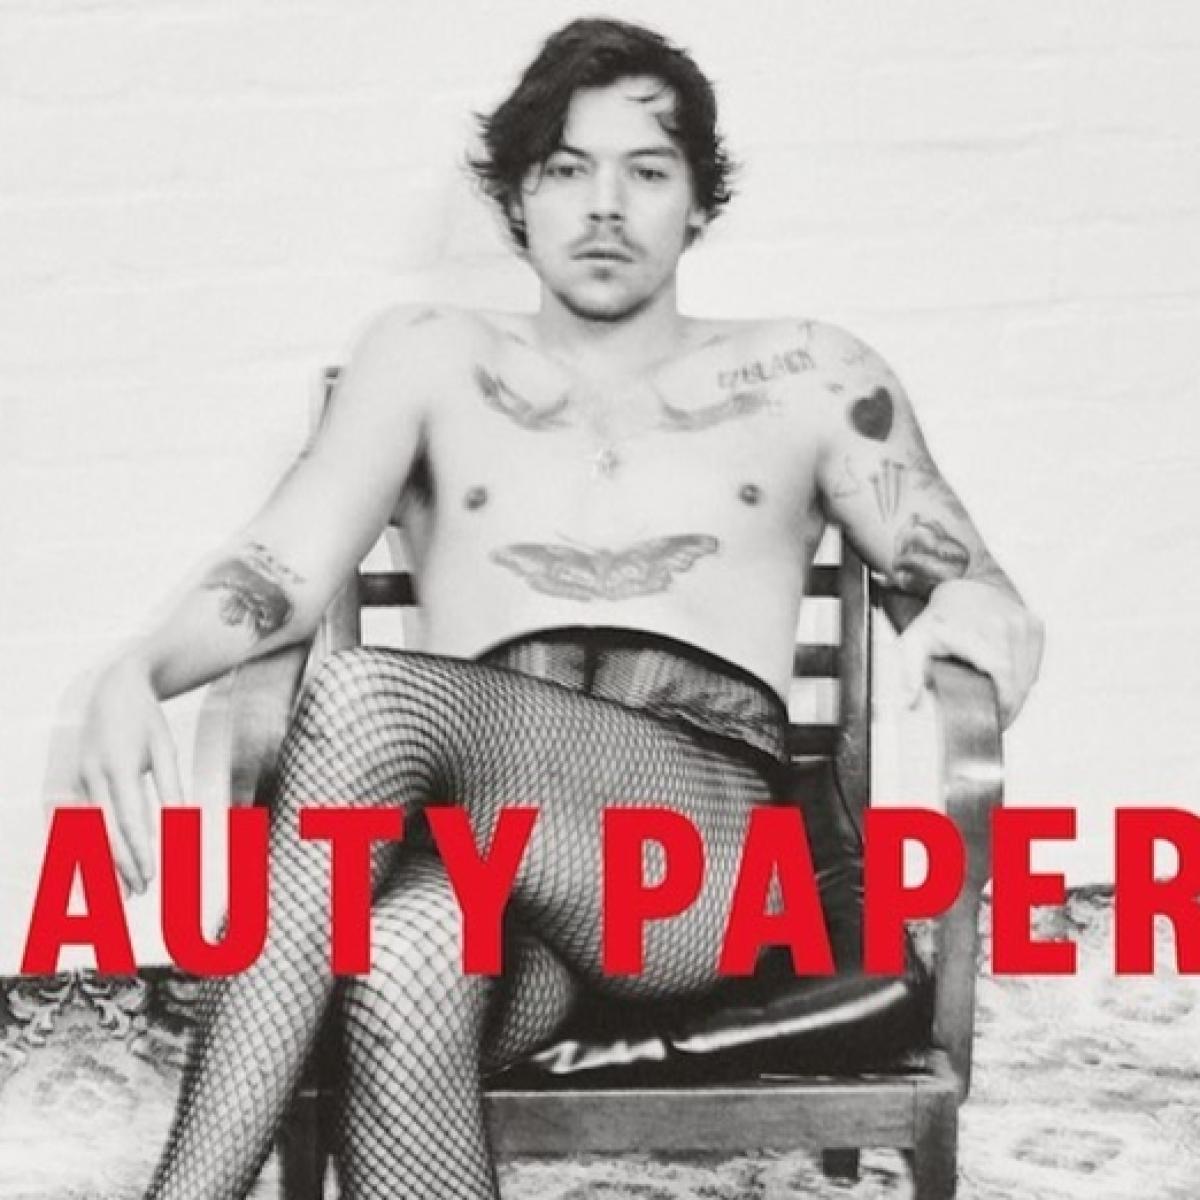 Harry Styles' picture wearing nothing but fishnet stockings crashes magazine website